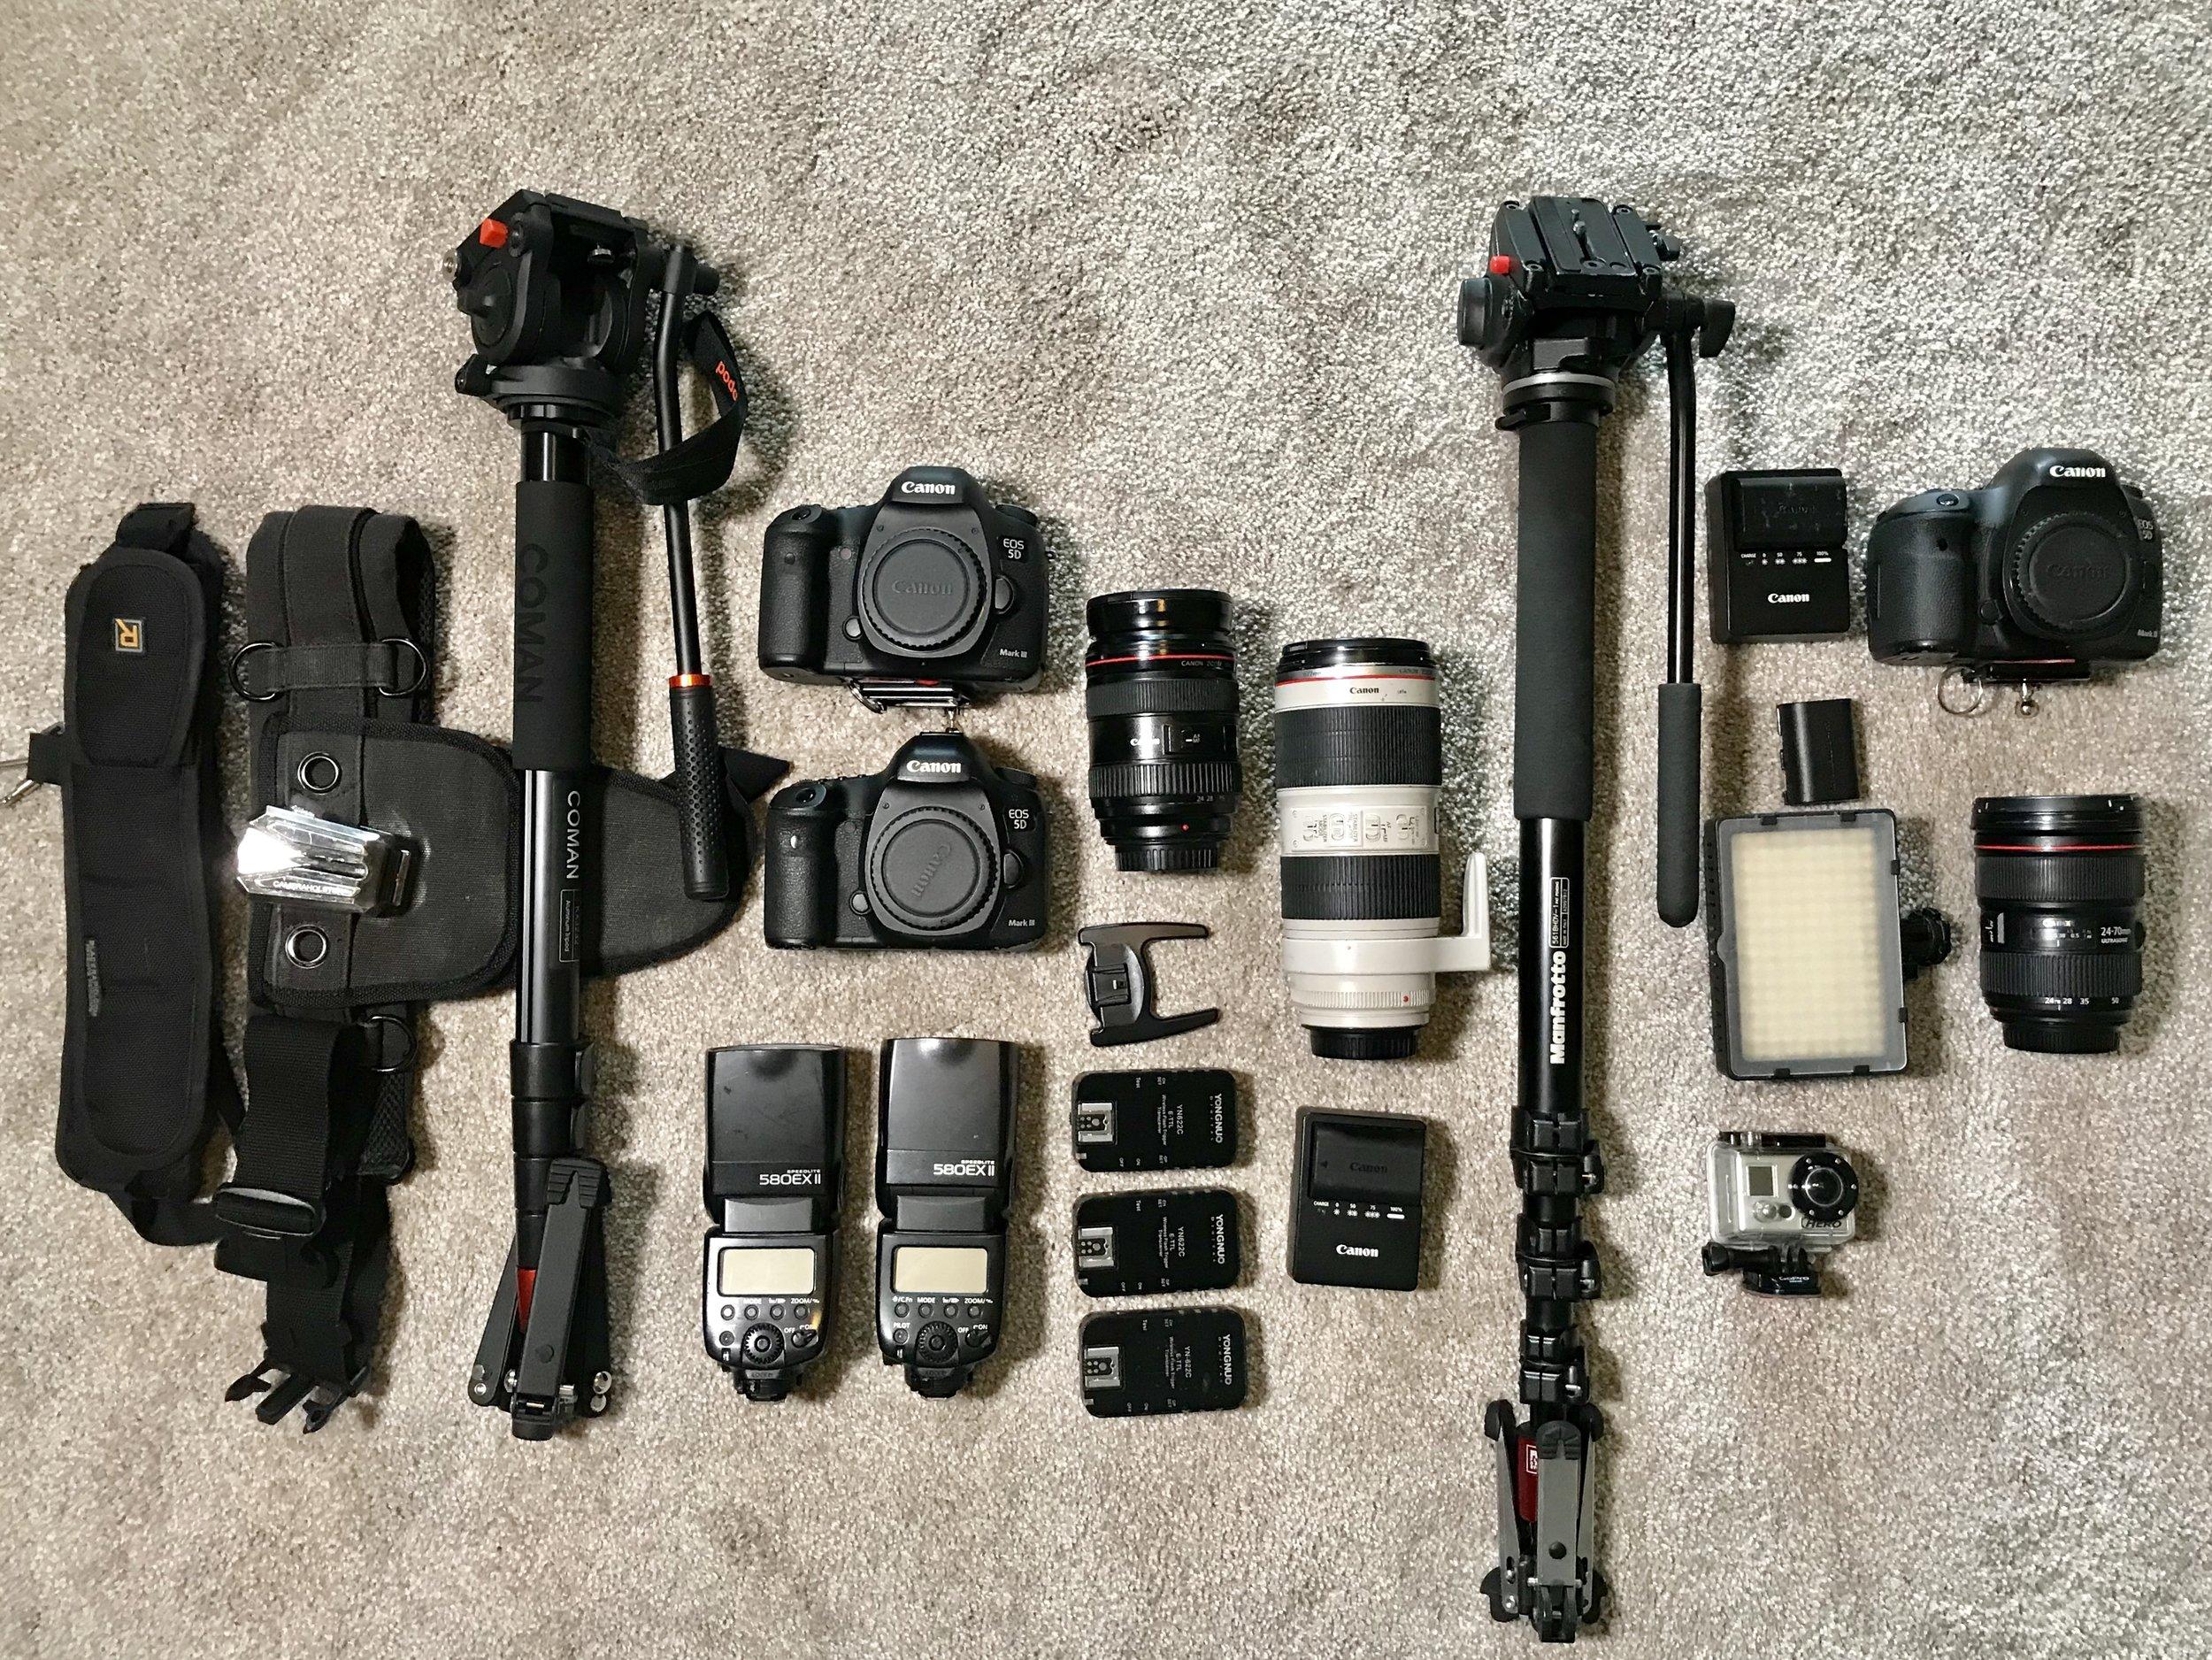 canon-camera-equipment-travel-photographer-orlando-event.jpg